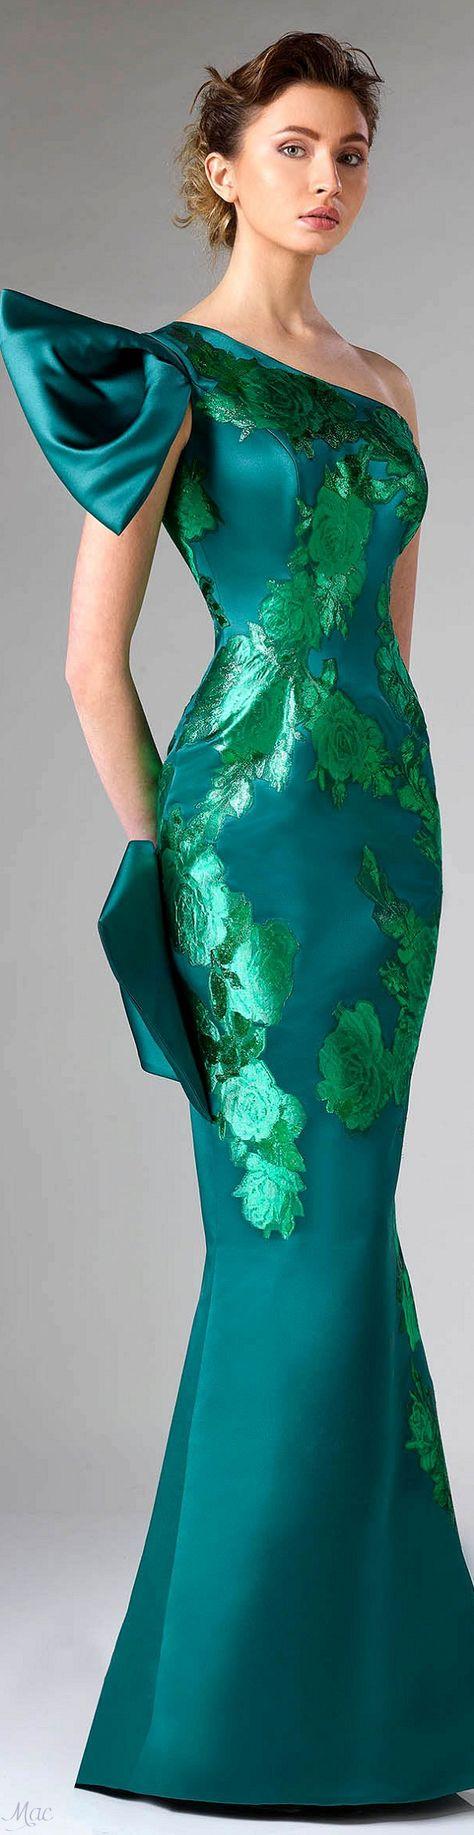 100 best vestidos images on Pinterest | Vestidos de novia, Vestido ...